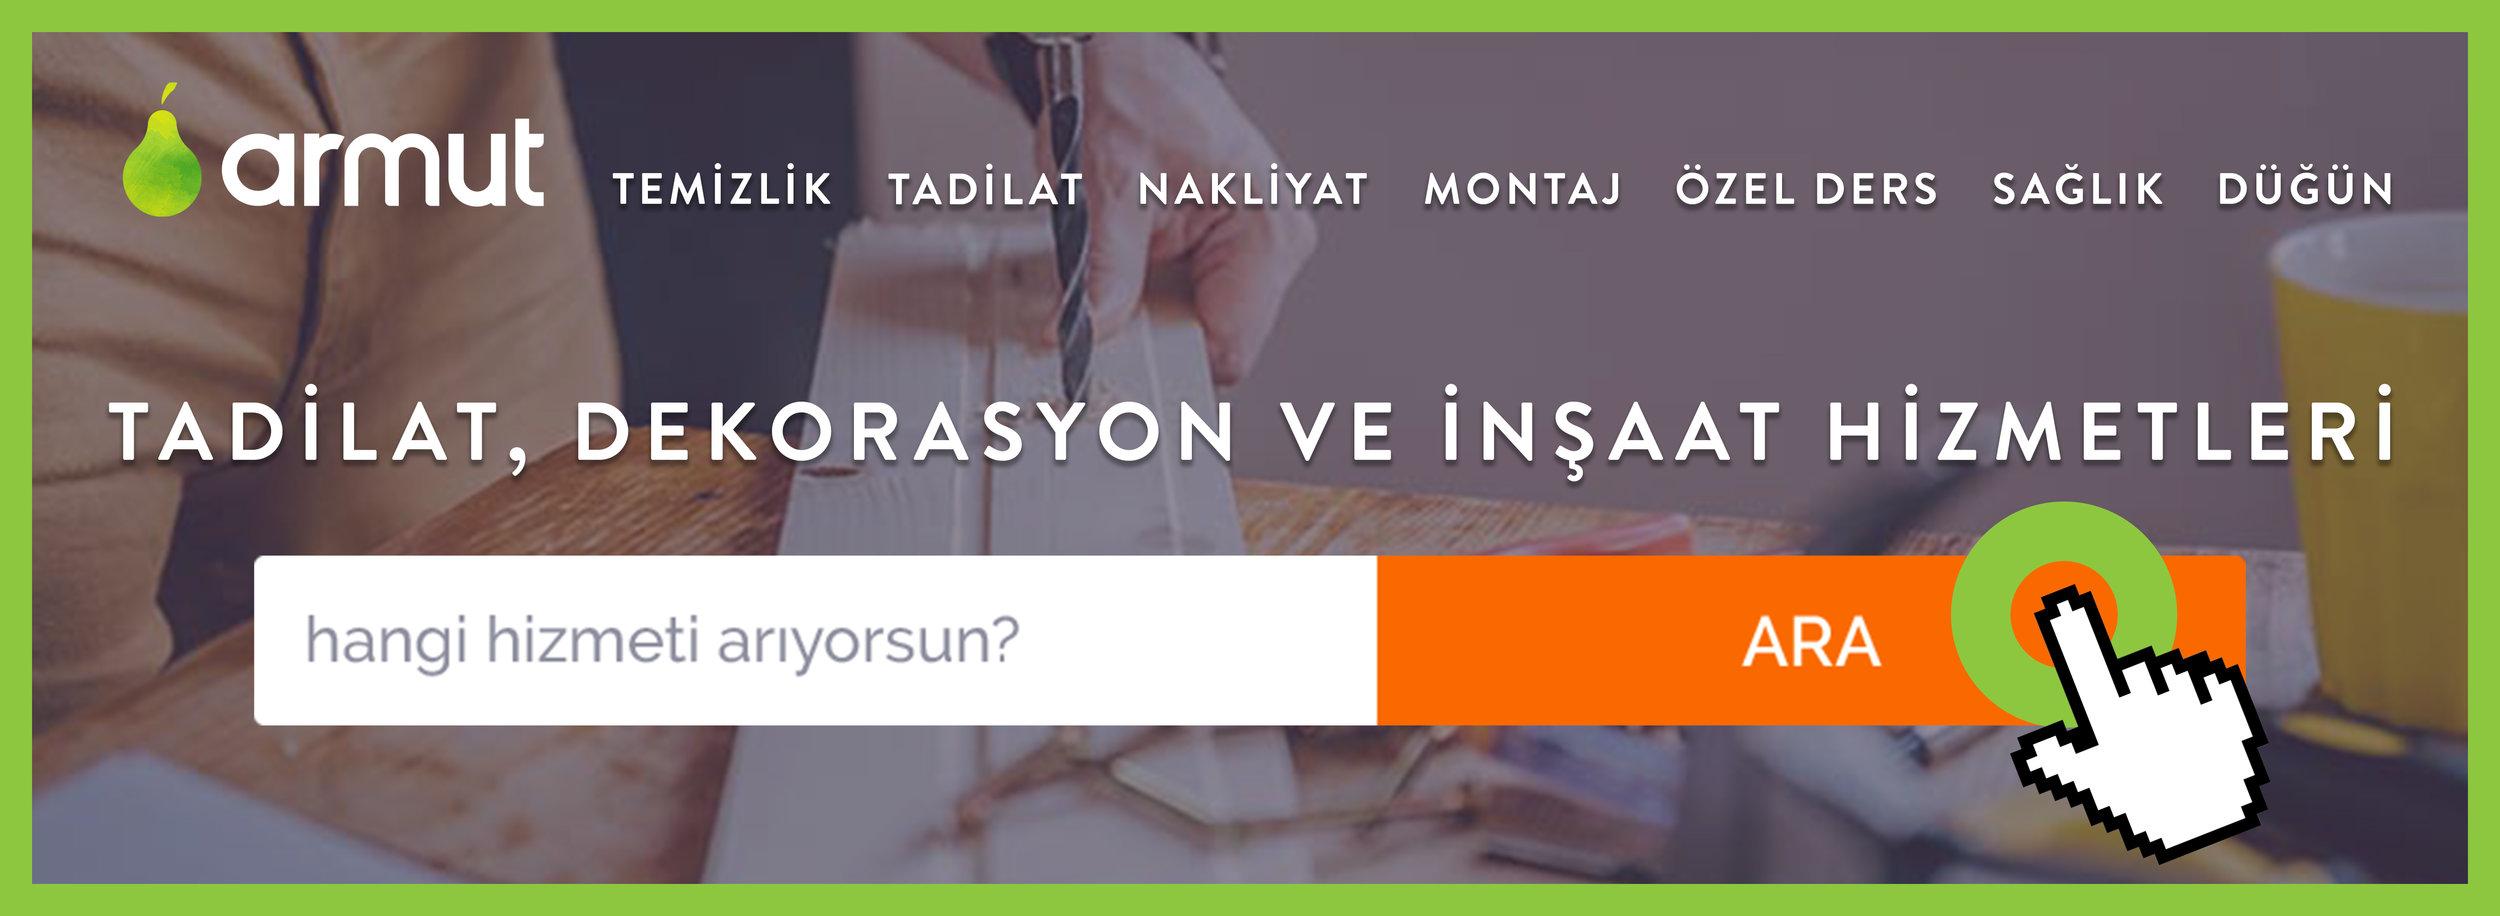 armut.com-tadilat